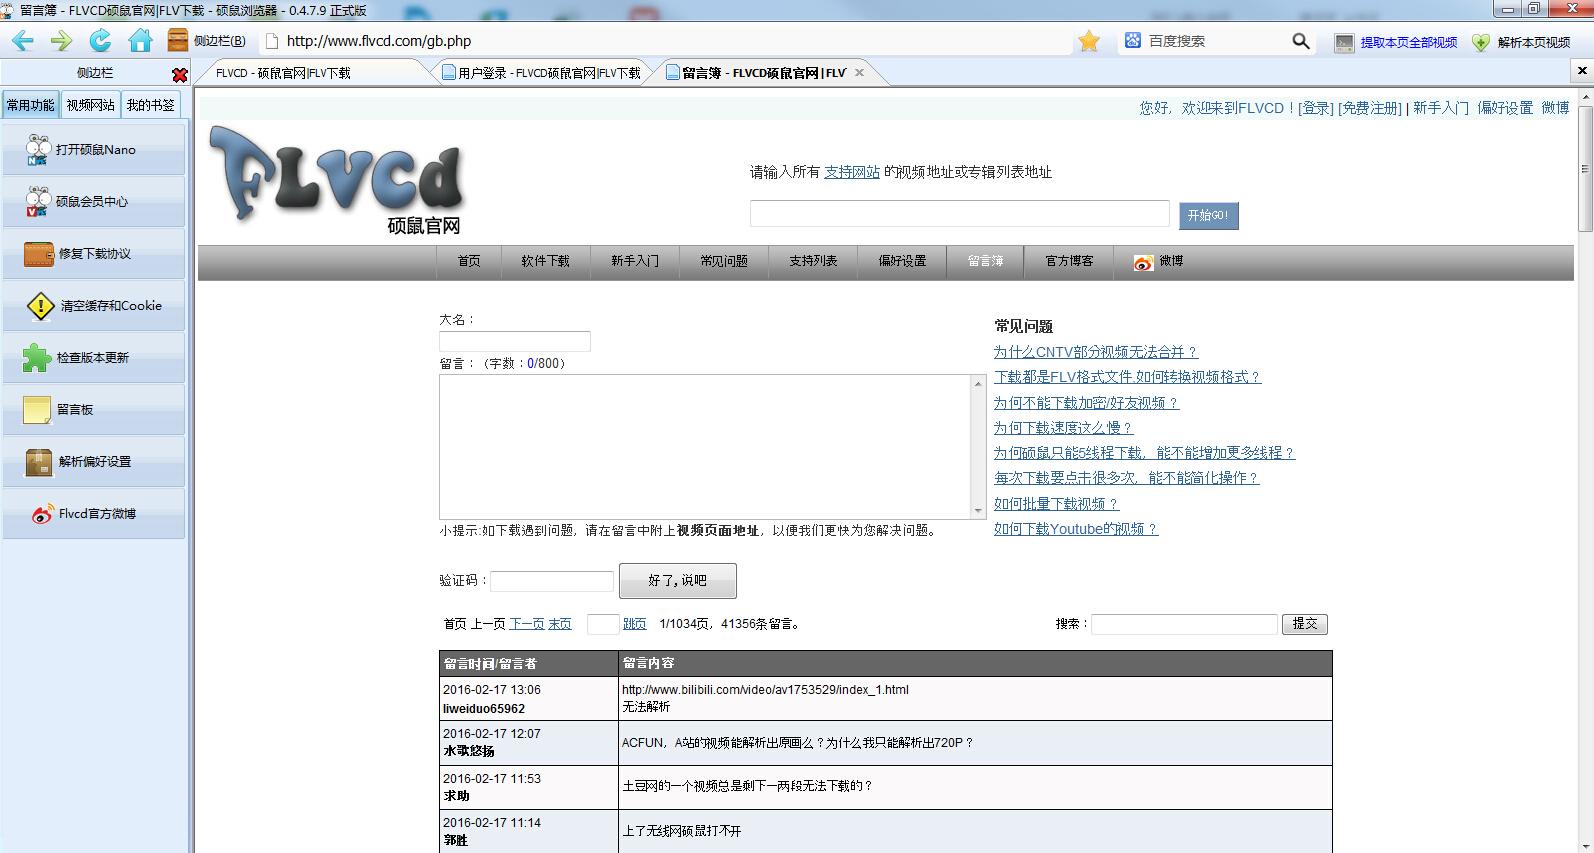 硕鼠FLV视频下载软件截图3